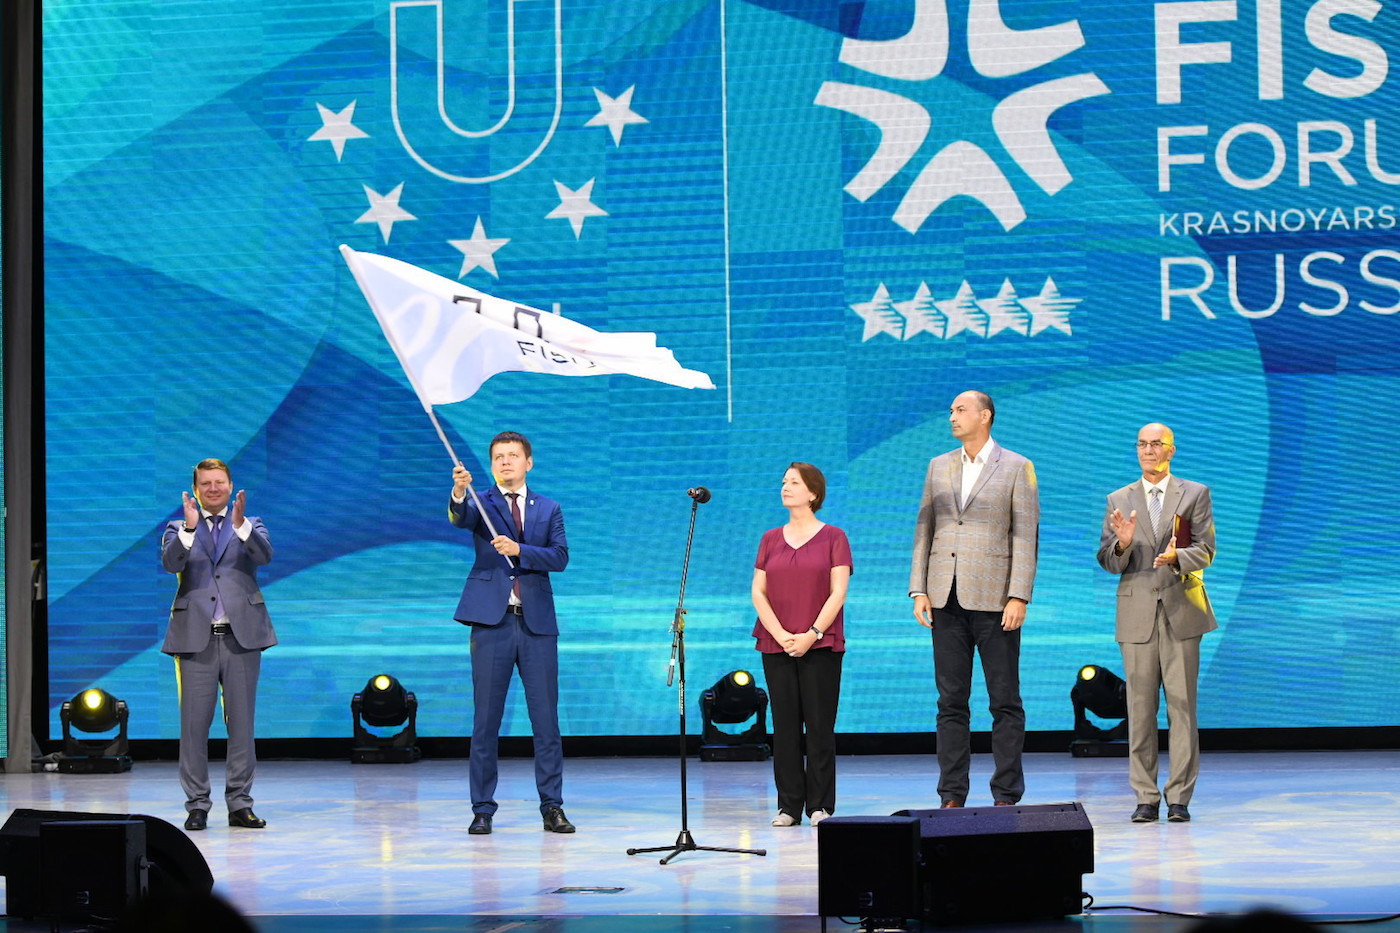 FISU World Forum set to be held online in August